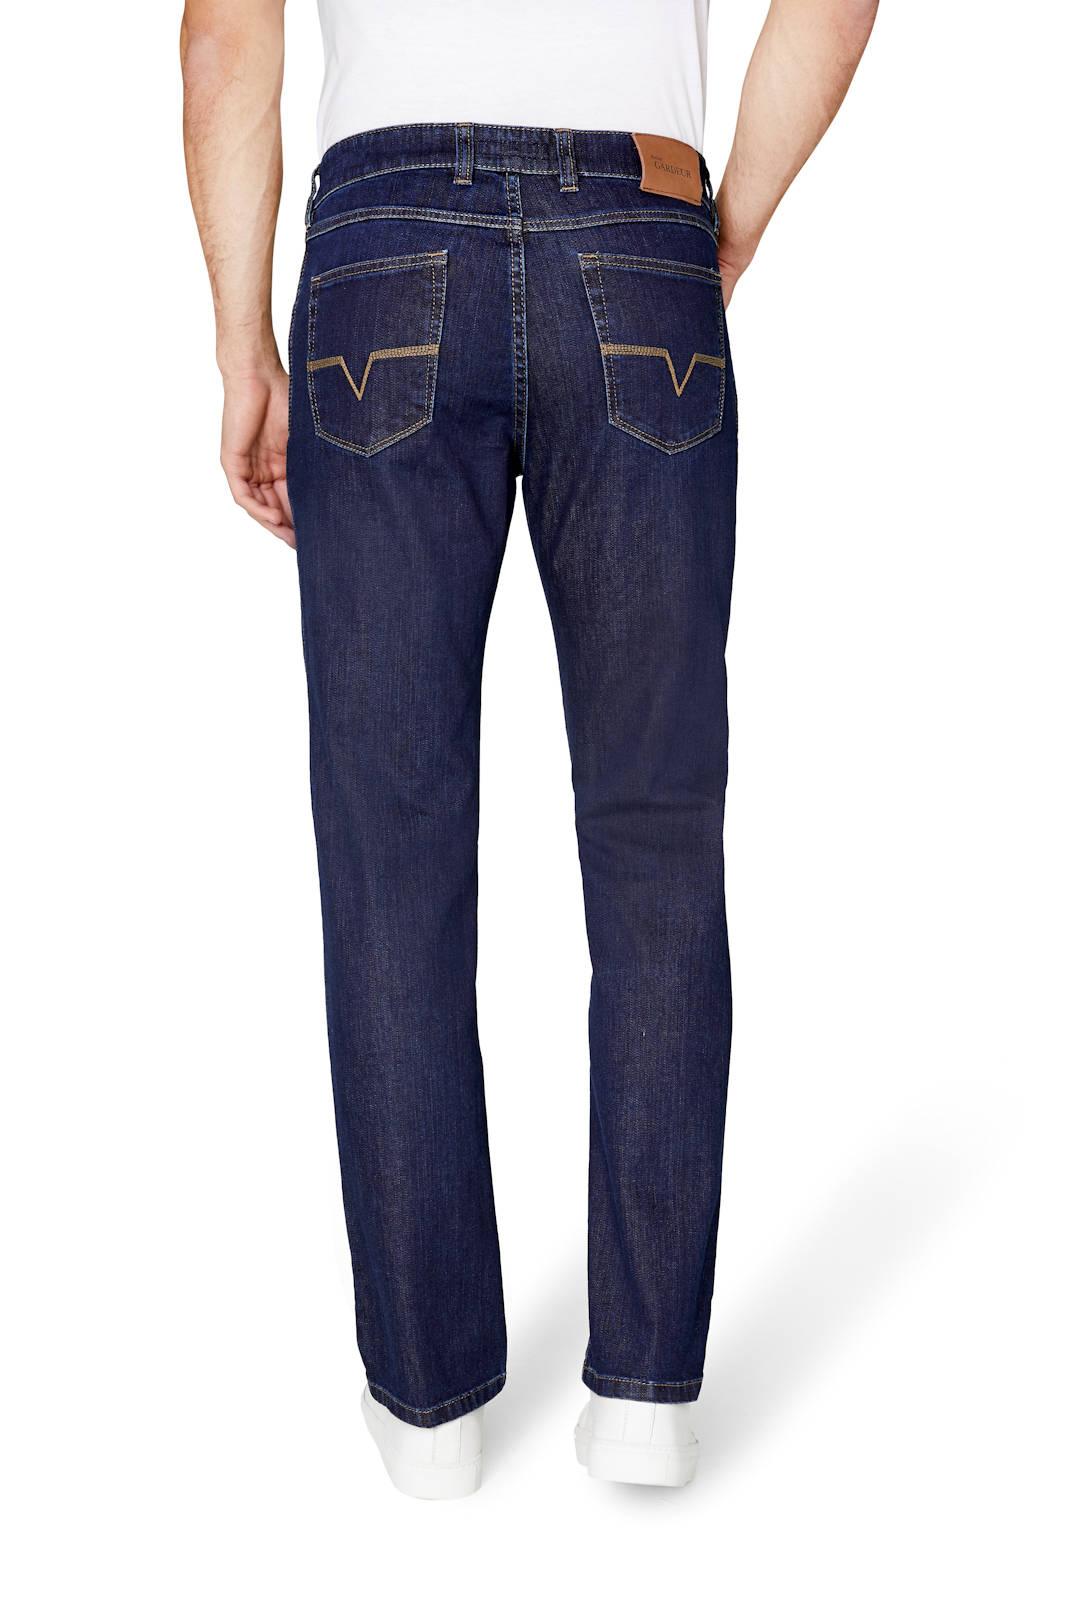 Atelier-GARDEUR-Jeans-NEVIO-11-Regular-Fit-Herren-Hose-Straight-Leg-Denim-NEU Indexbild 12